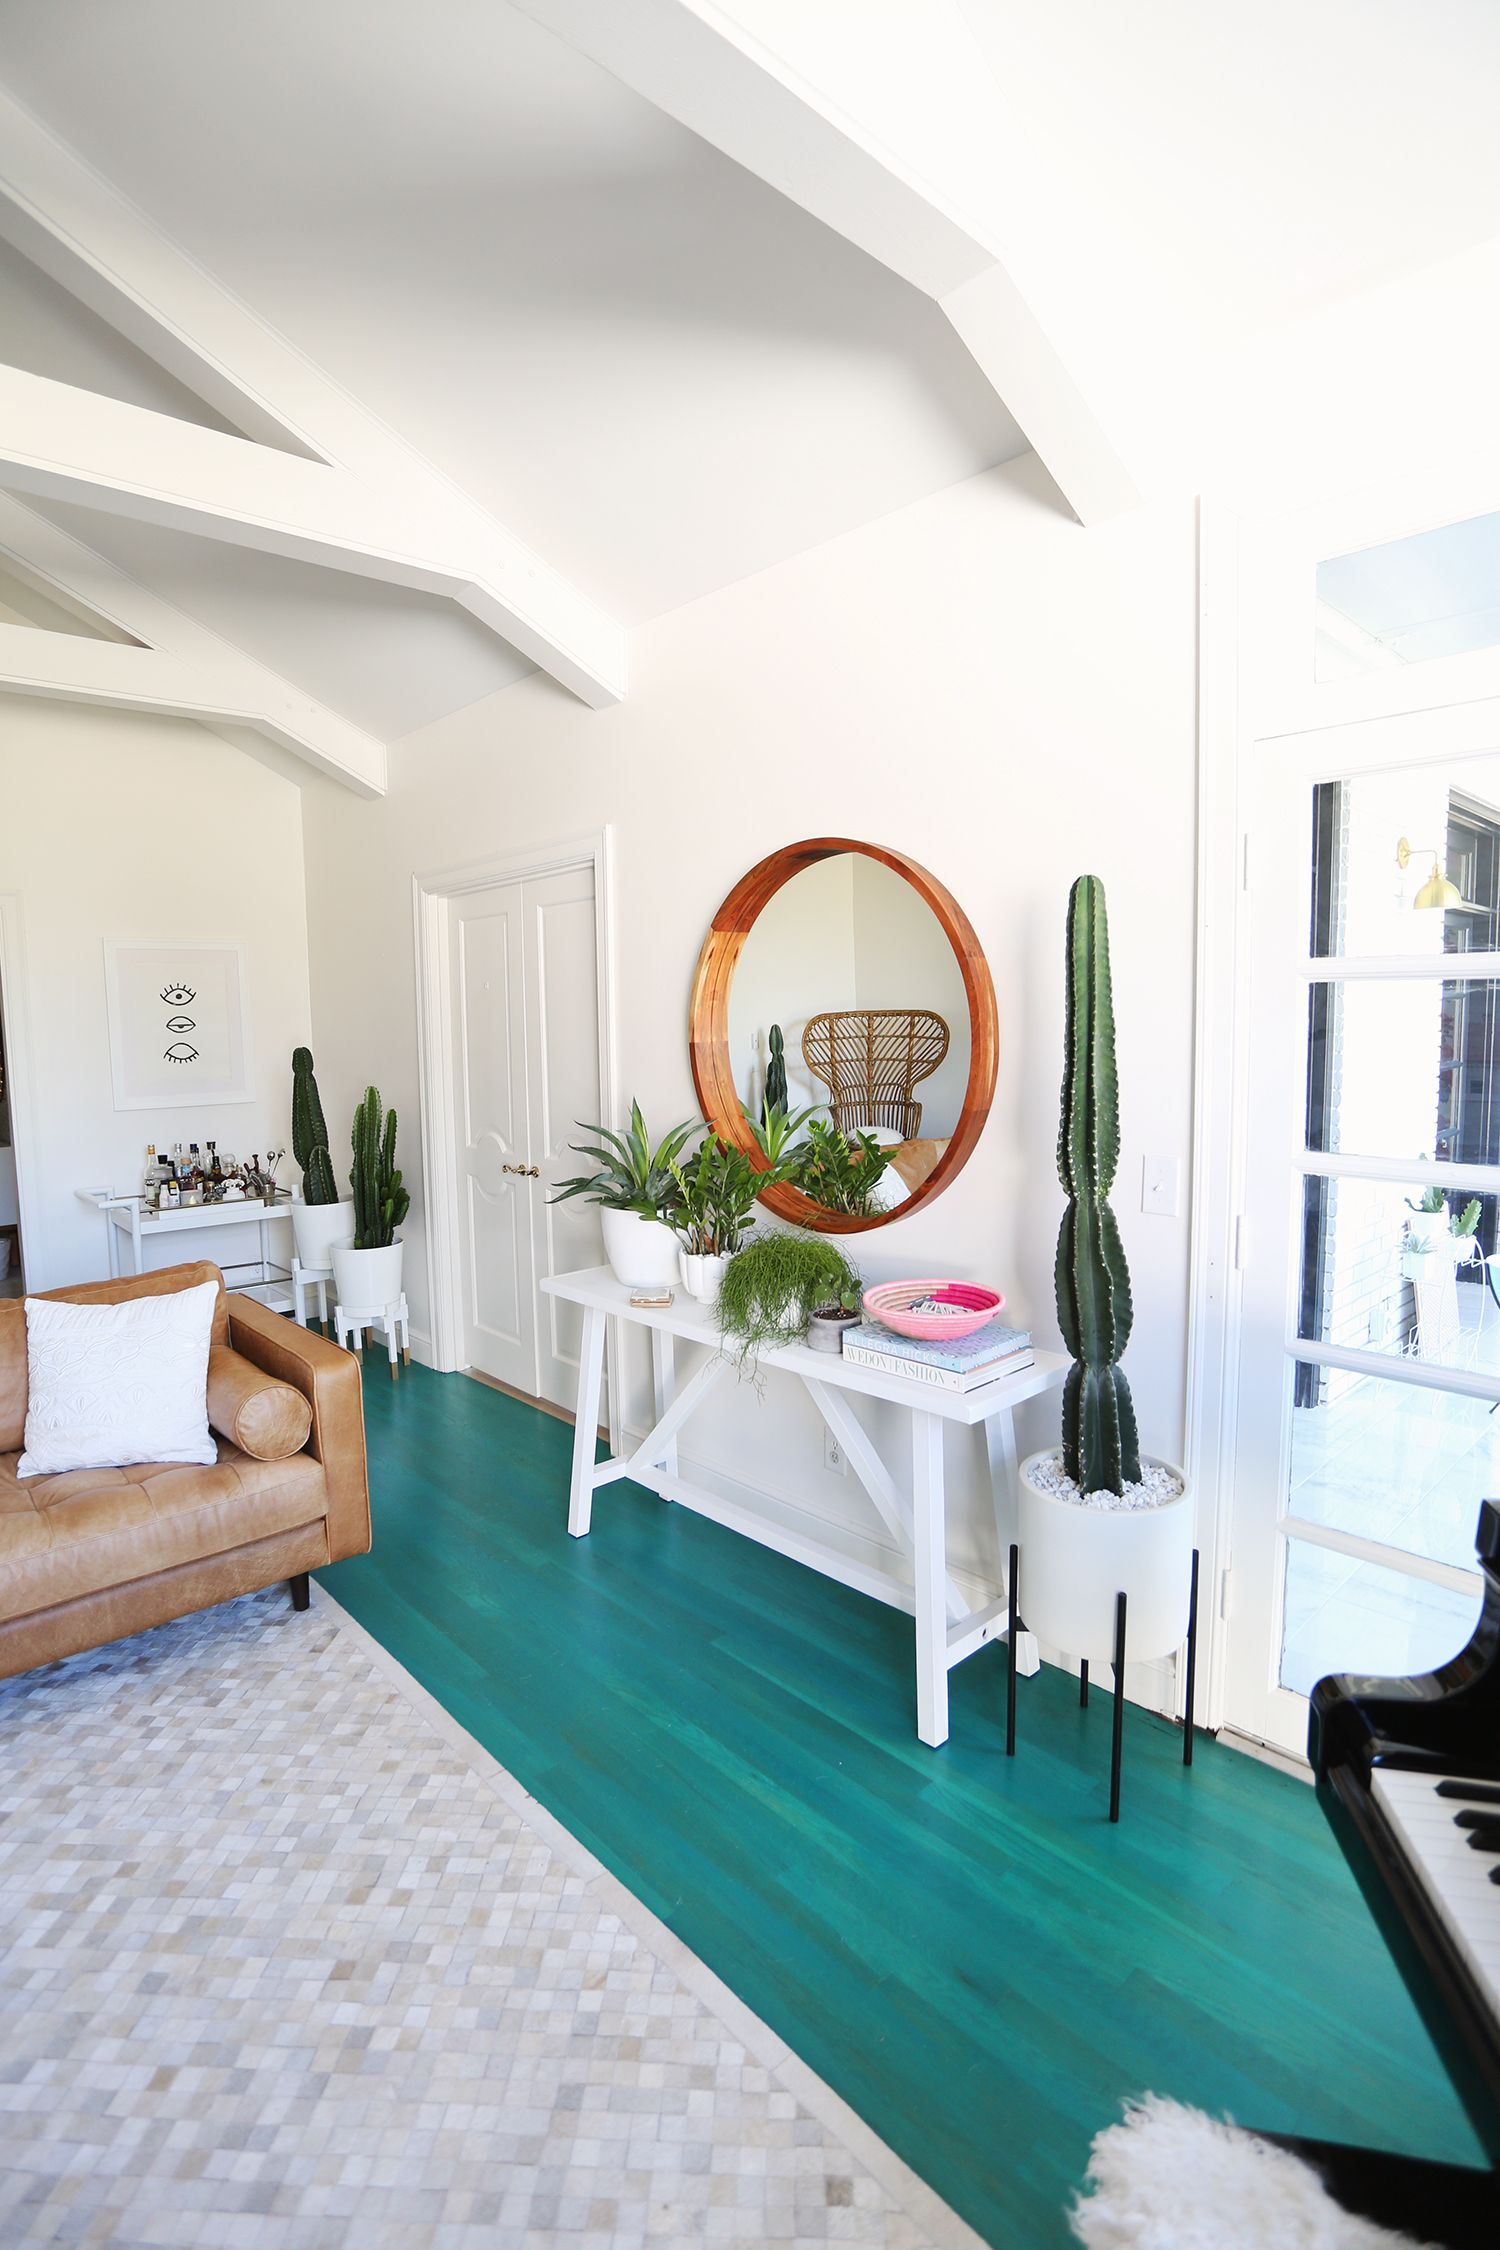 color washed floors            Elsie Larson's Living Room Tour